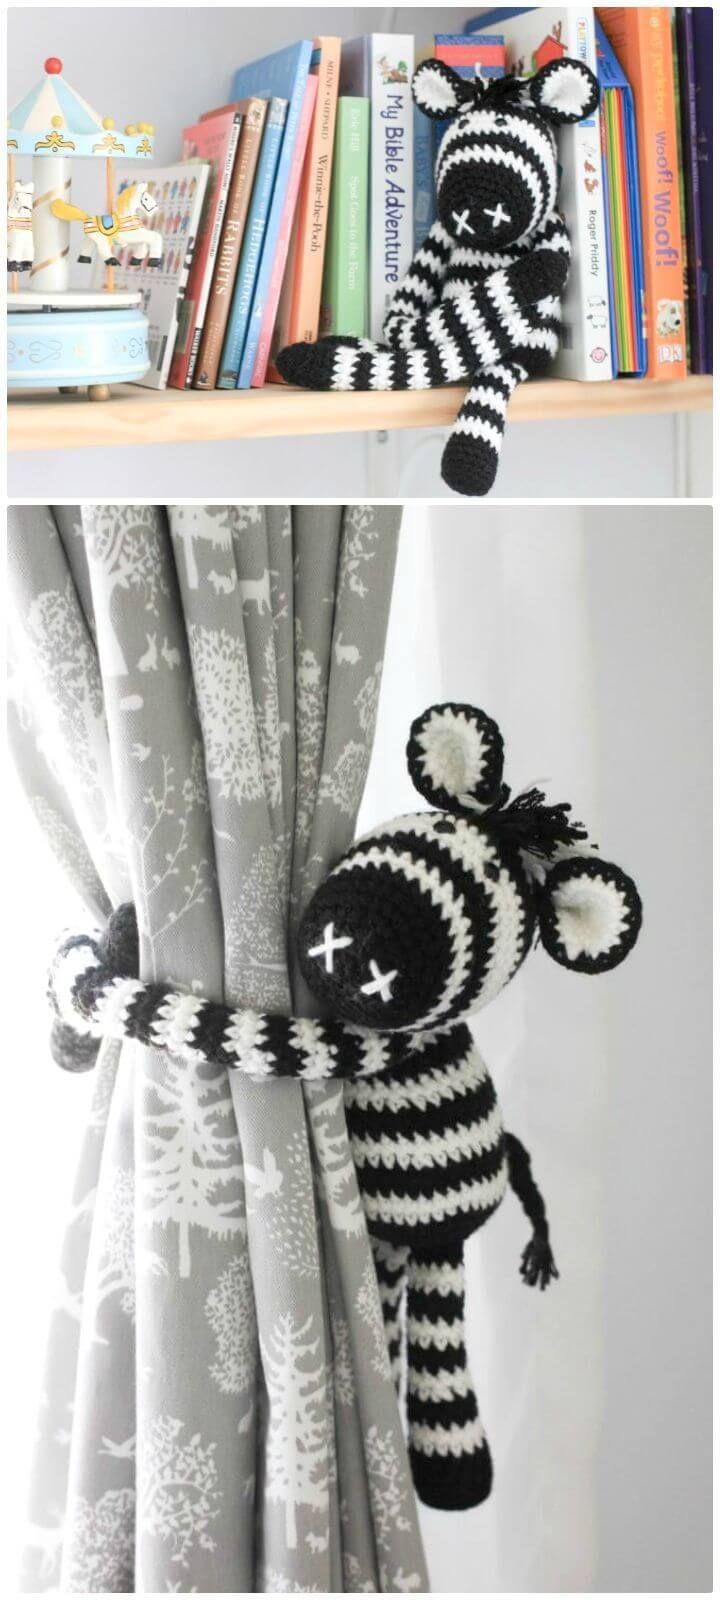 26 Free Crochet Zebra Patterns / Hat, Blanket, Amigurumi | Amigurumi ...